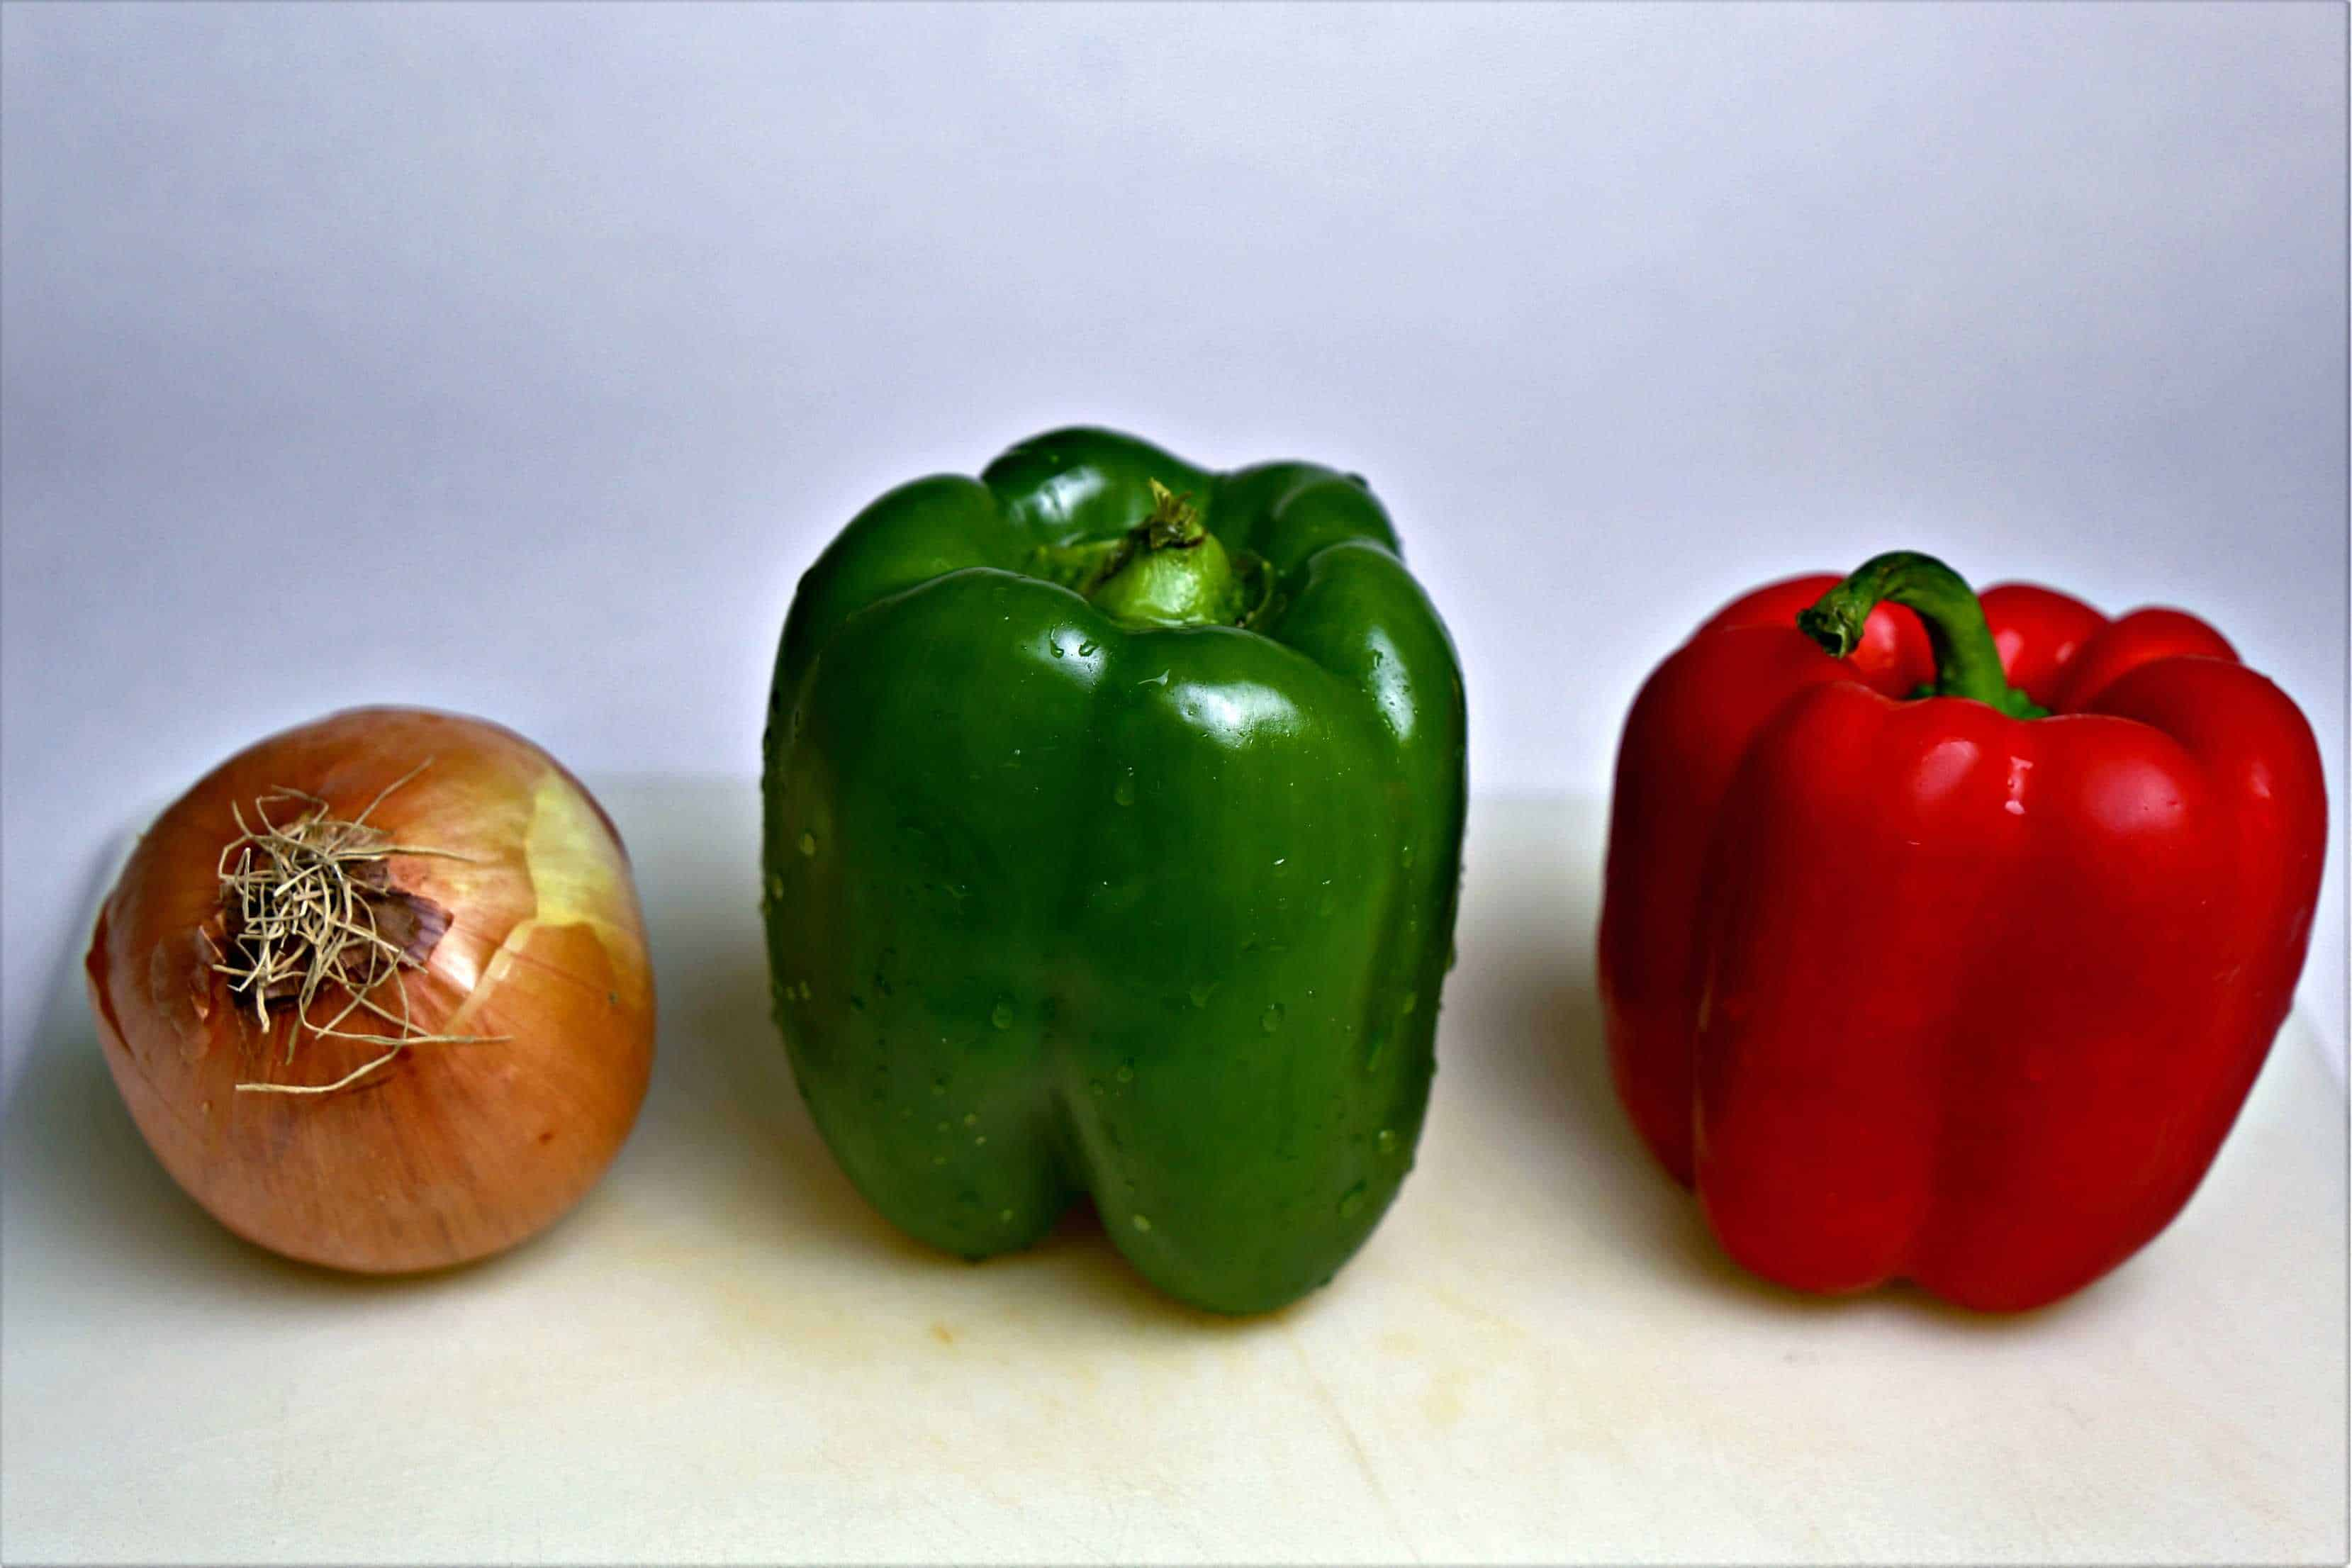 an onion, green bell pepper, and a red bell pepper